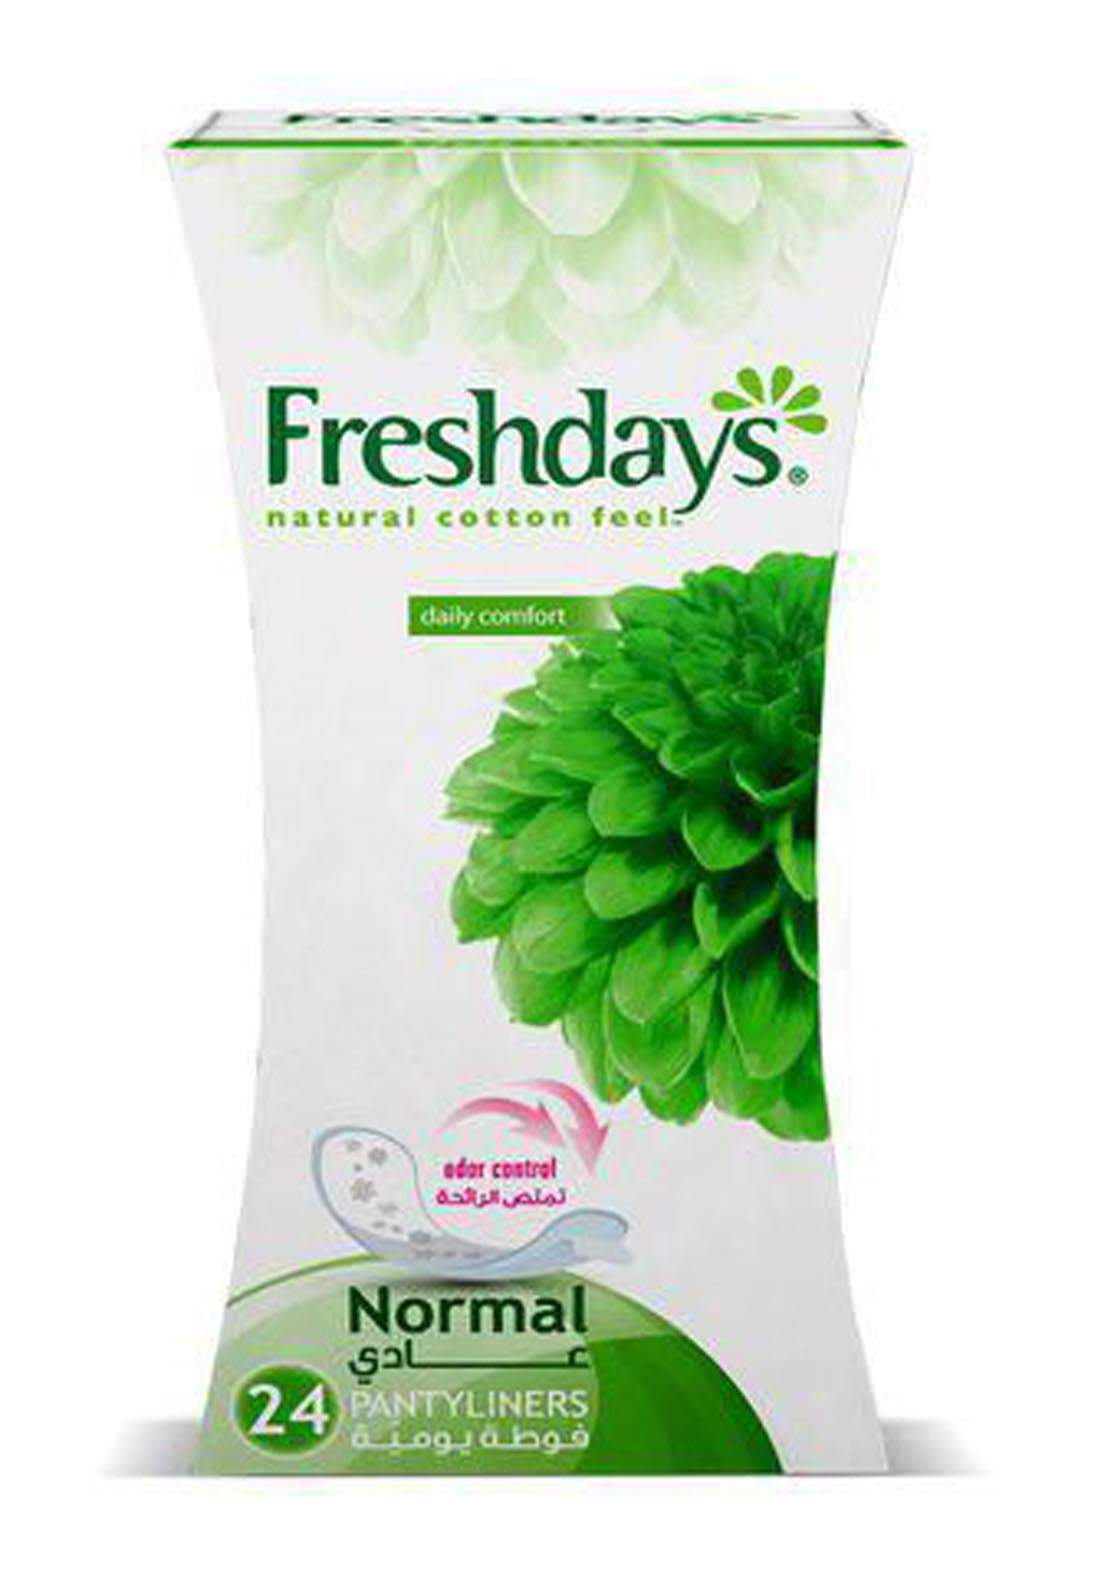 Freshdays Natural Cotton Feel Normal Pantyliners 24 Pies فوط صحية